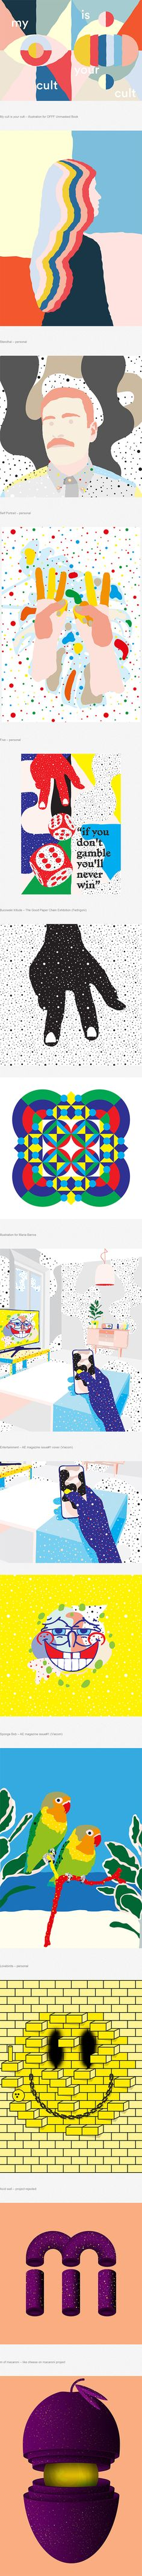 illustrations I